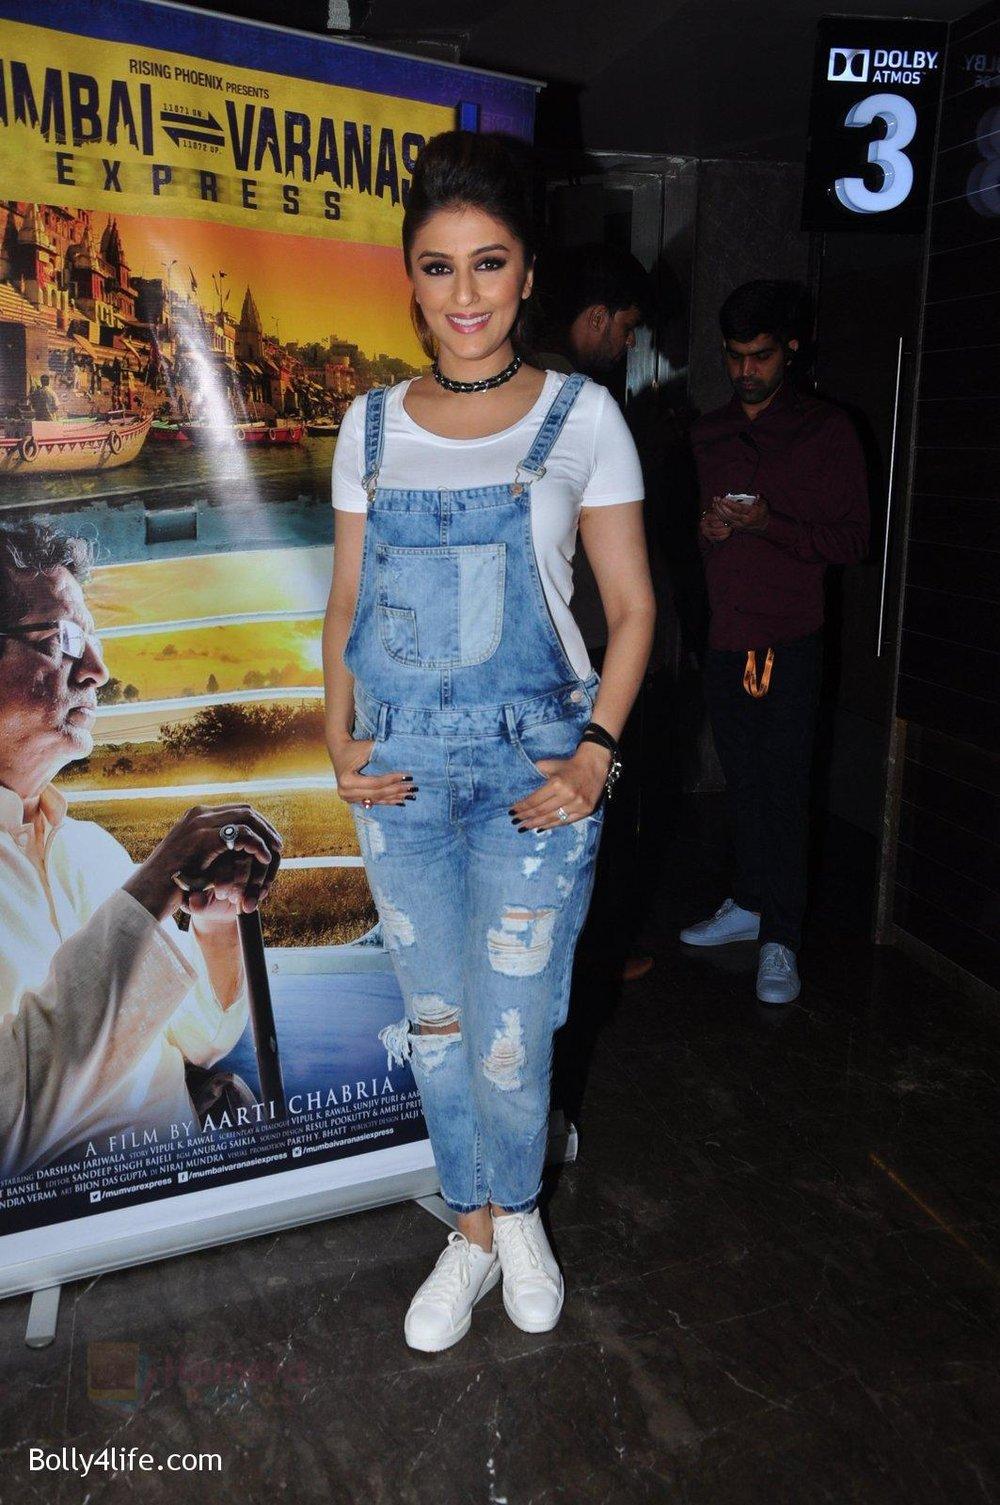 Aarti-Chhabria-at-Mumbai-Varanasi-screening-at-Jagran-film-fest-on-26th-Sept-2016-24.jpg